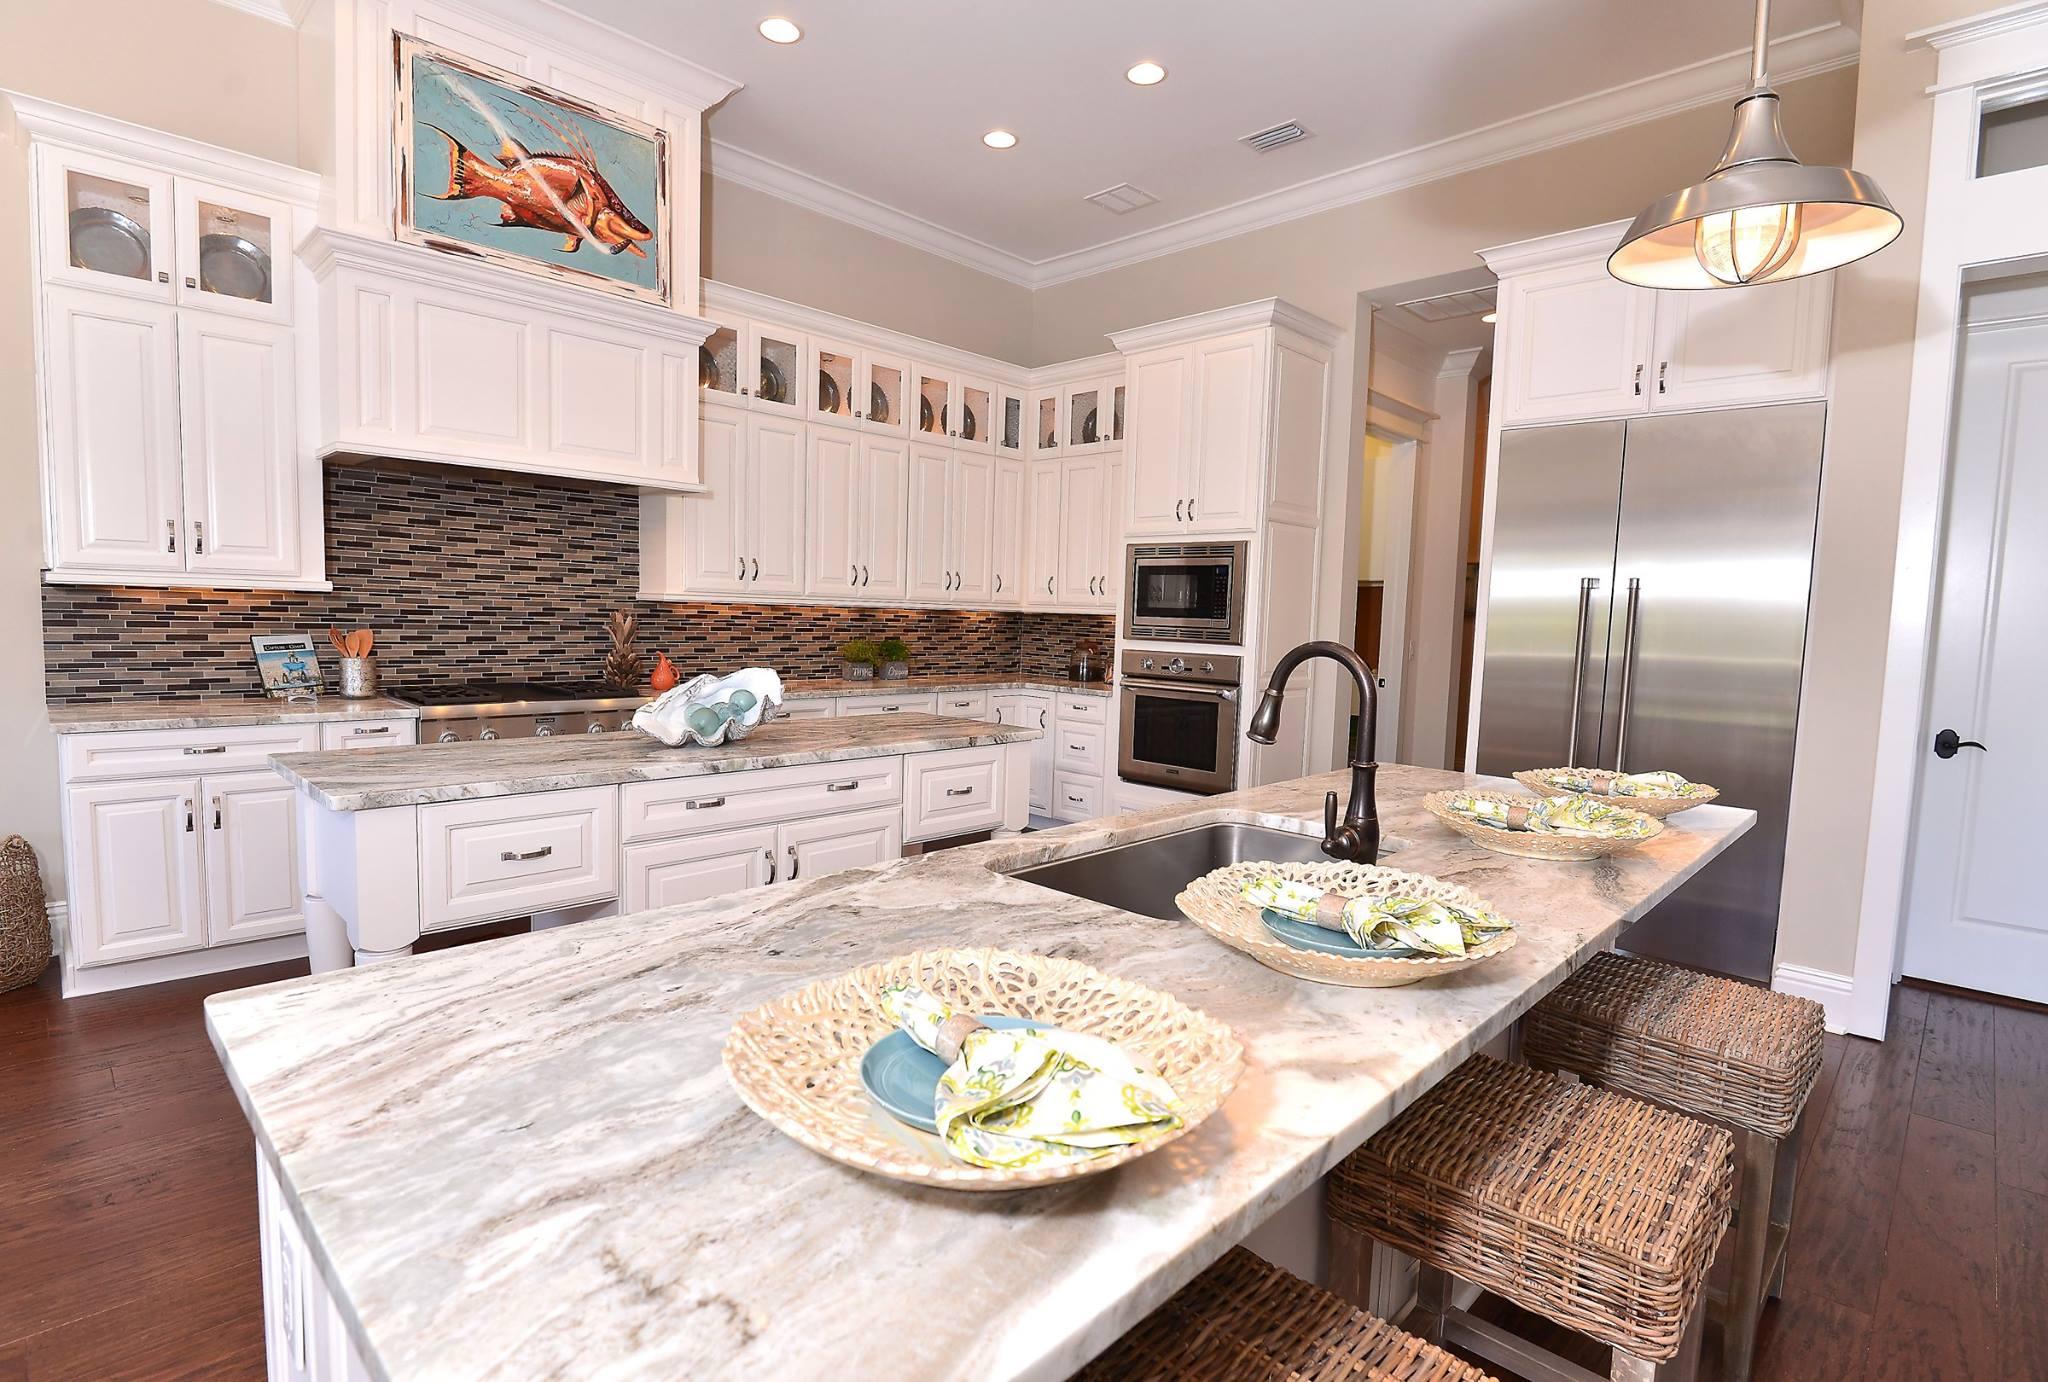 Javic kitchen.jpg